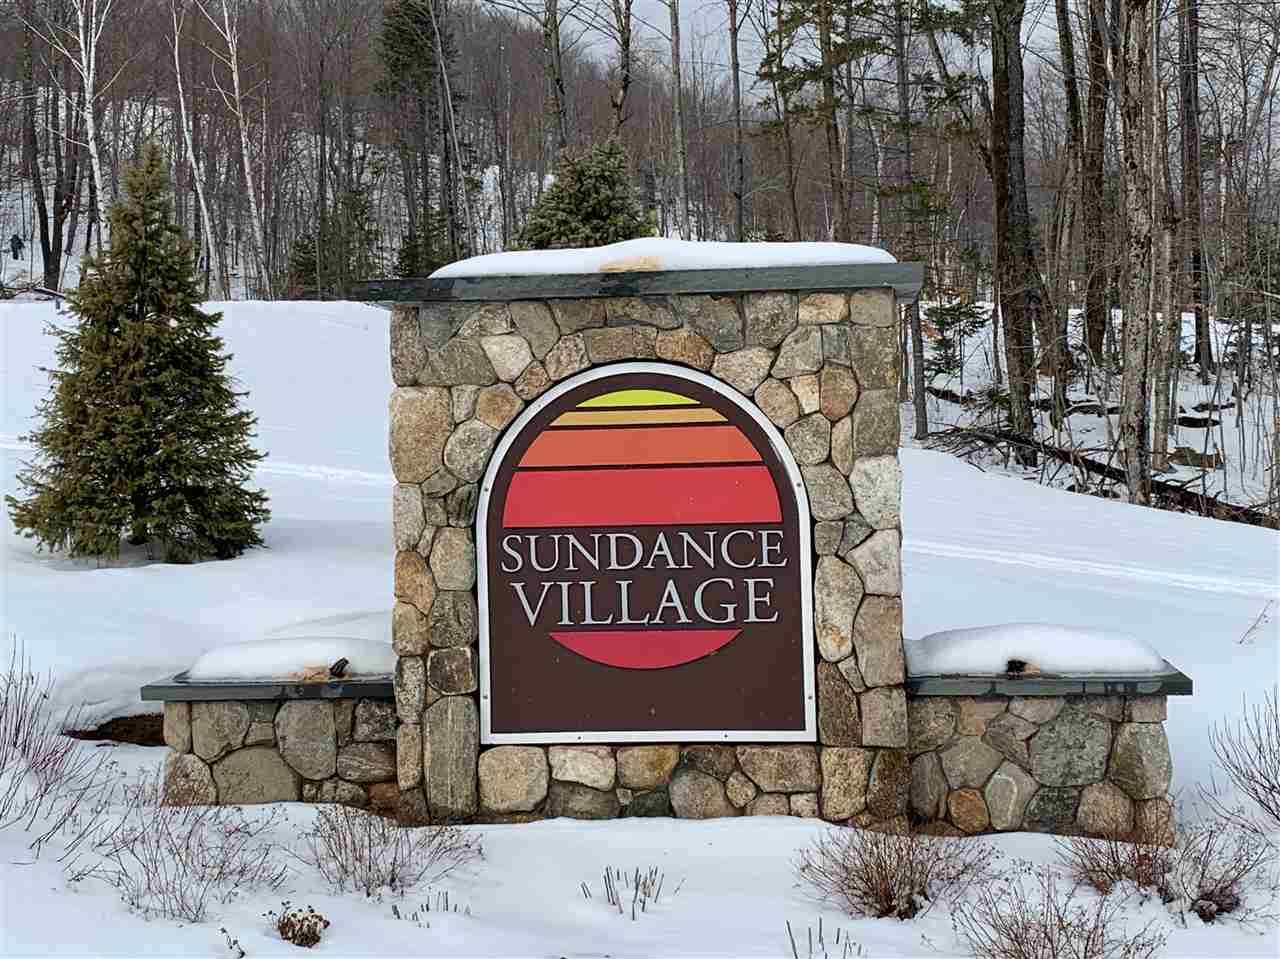 Mount-Snow-Real-Estate-4500048-1